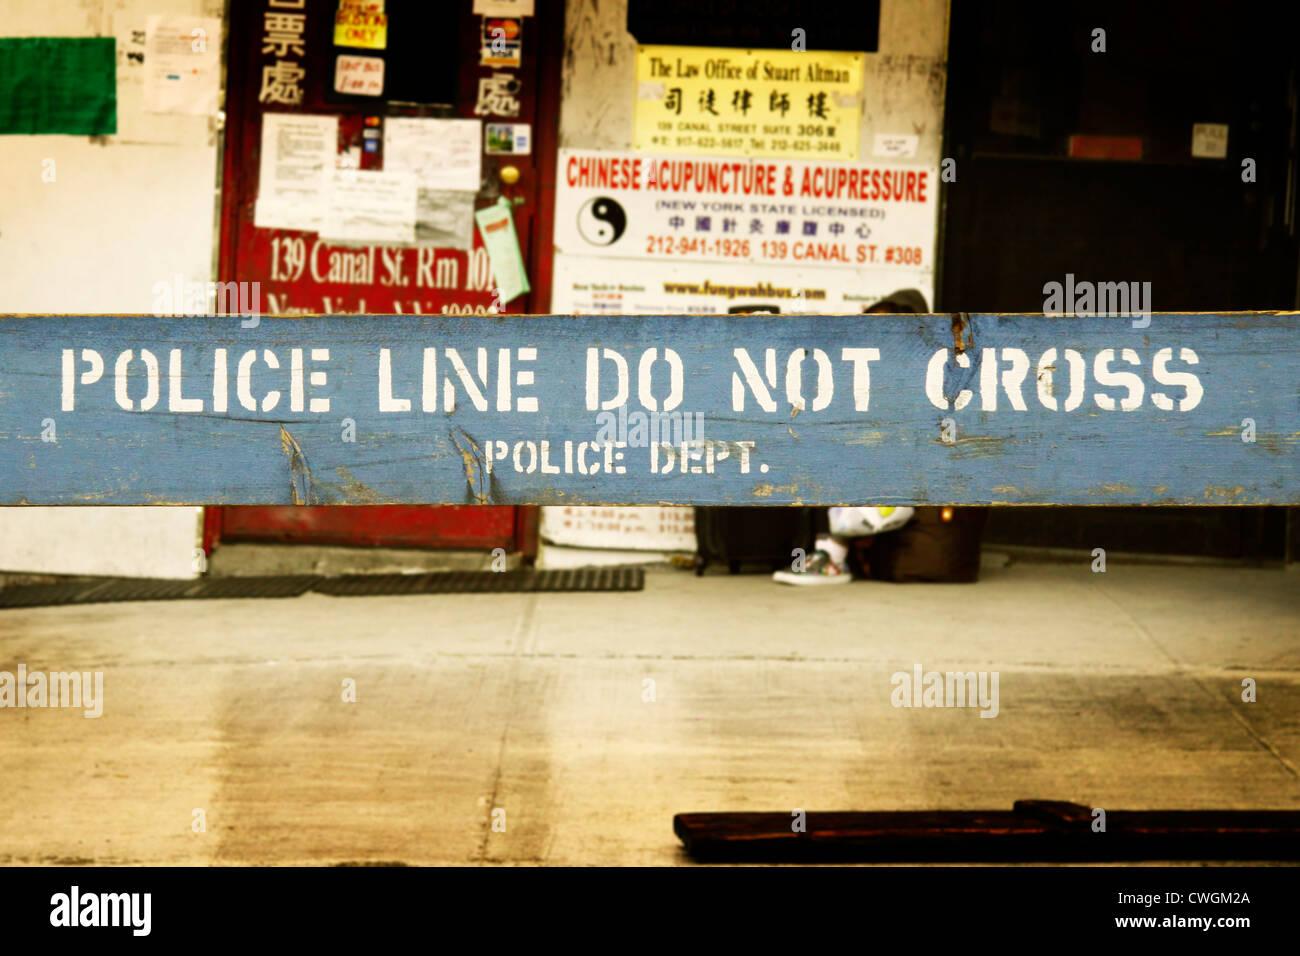 New York police line do not cross - Stock Image